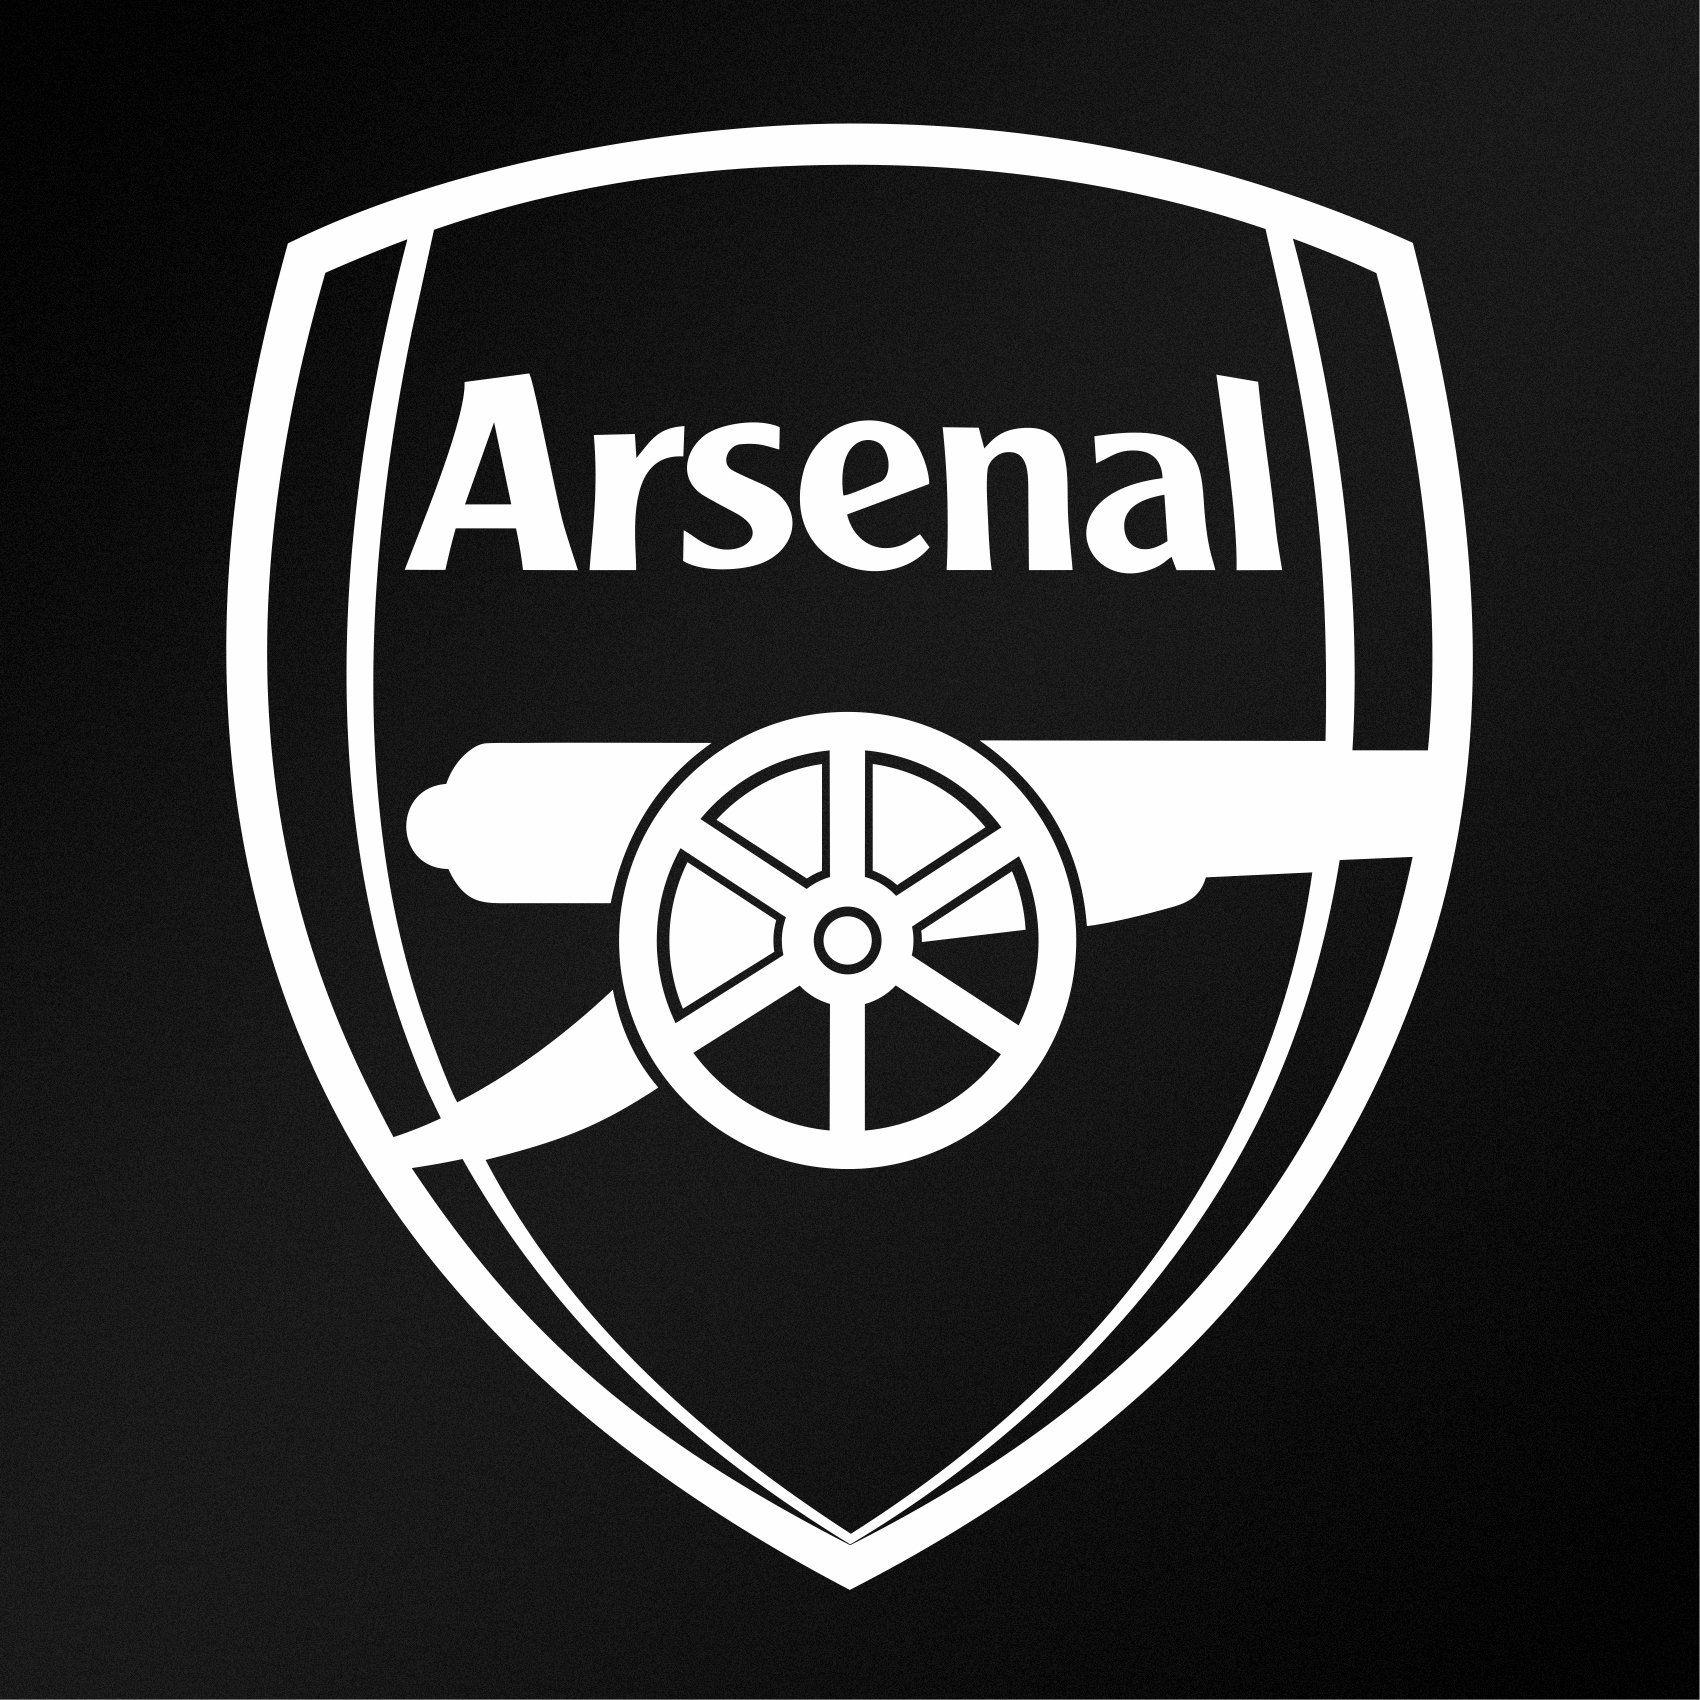 Arsenal F C Logo Vinyl Decal Sticker